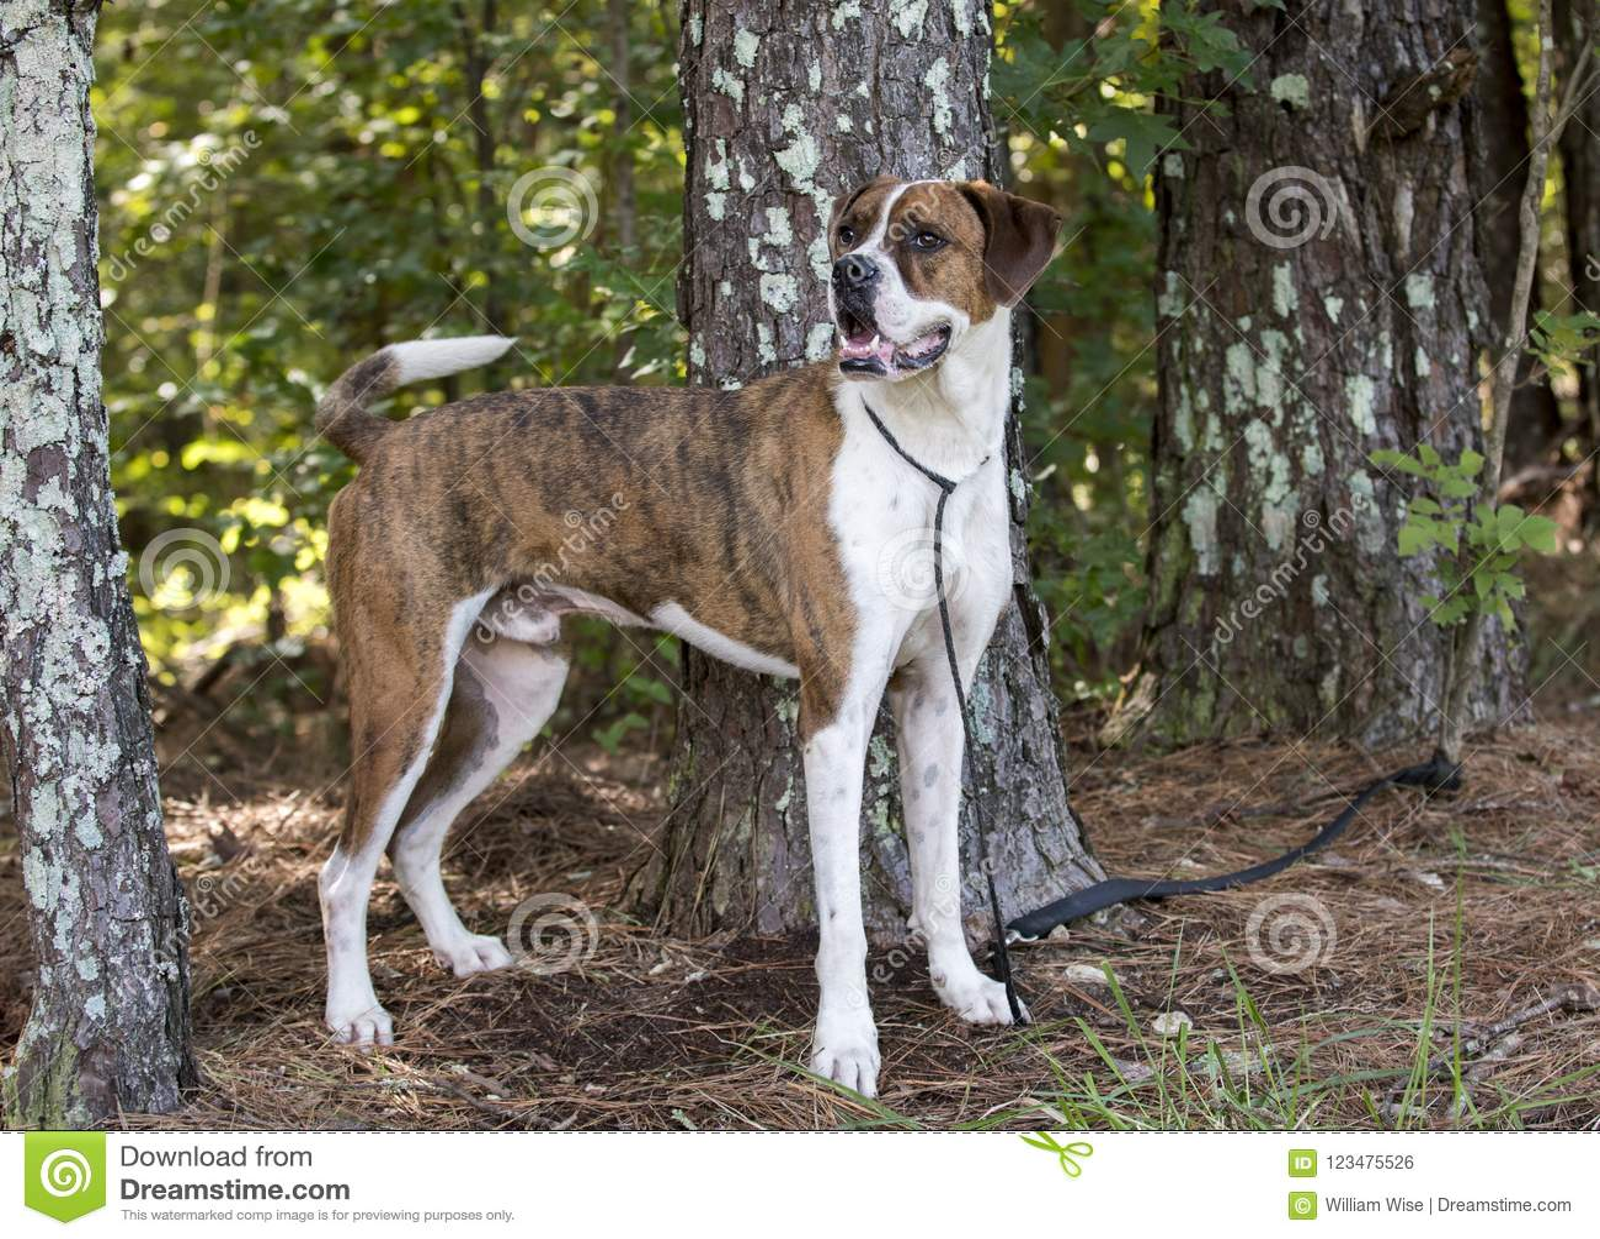 Boxer American Bulldog Mixed Breed Dog Stock Photo - Image